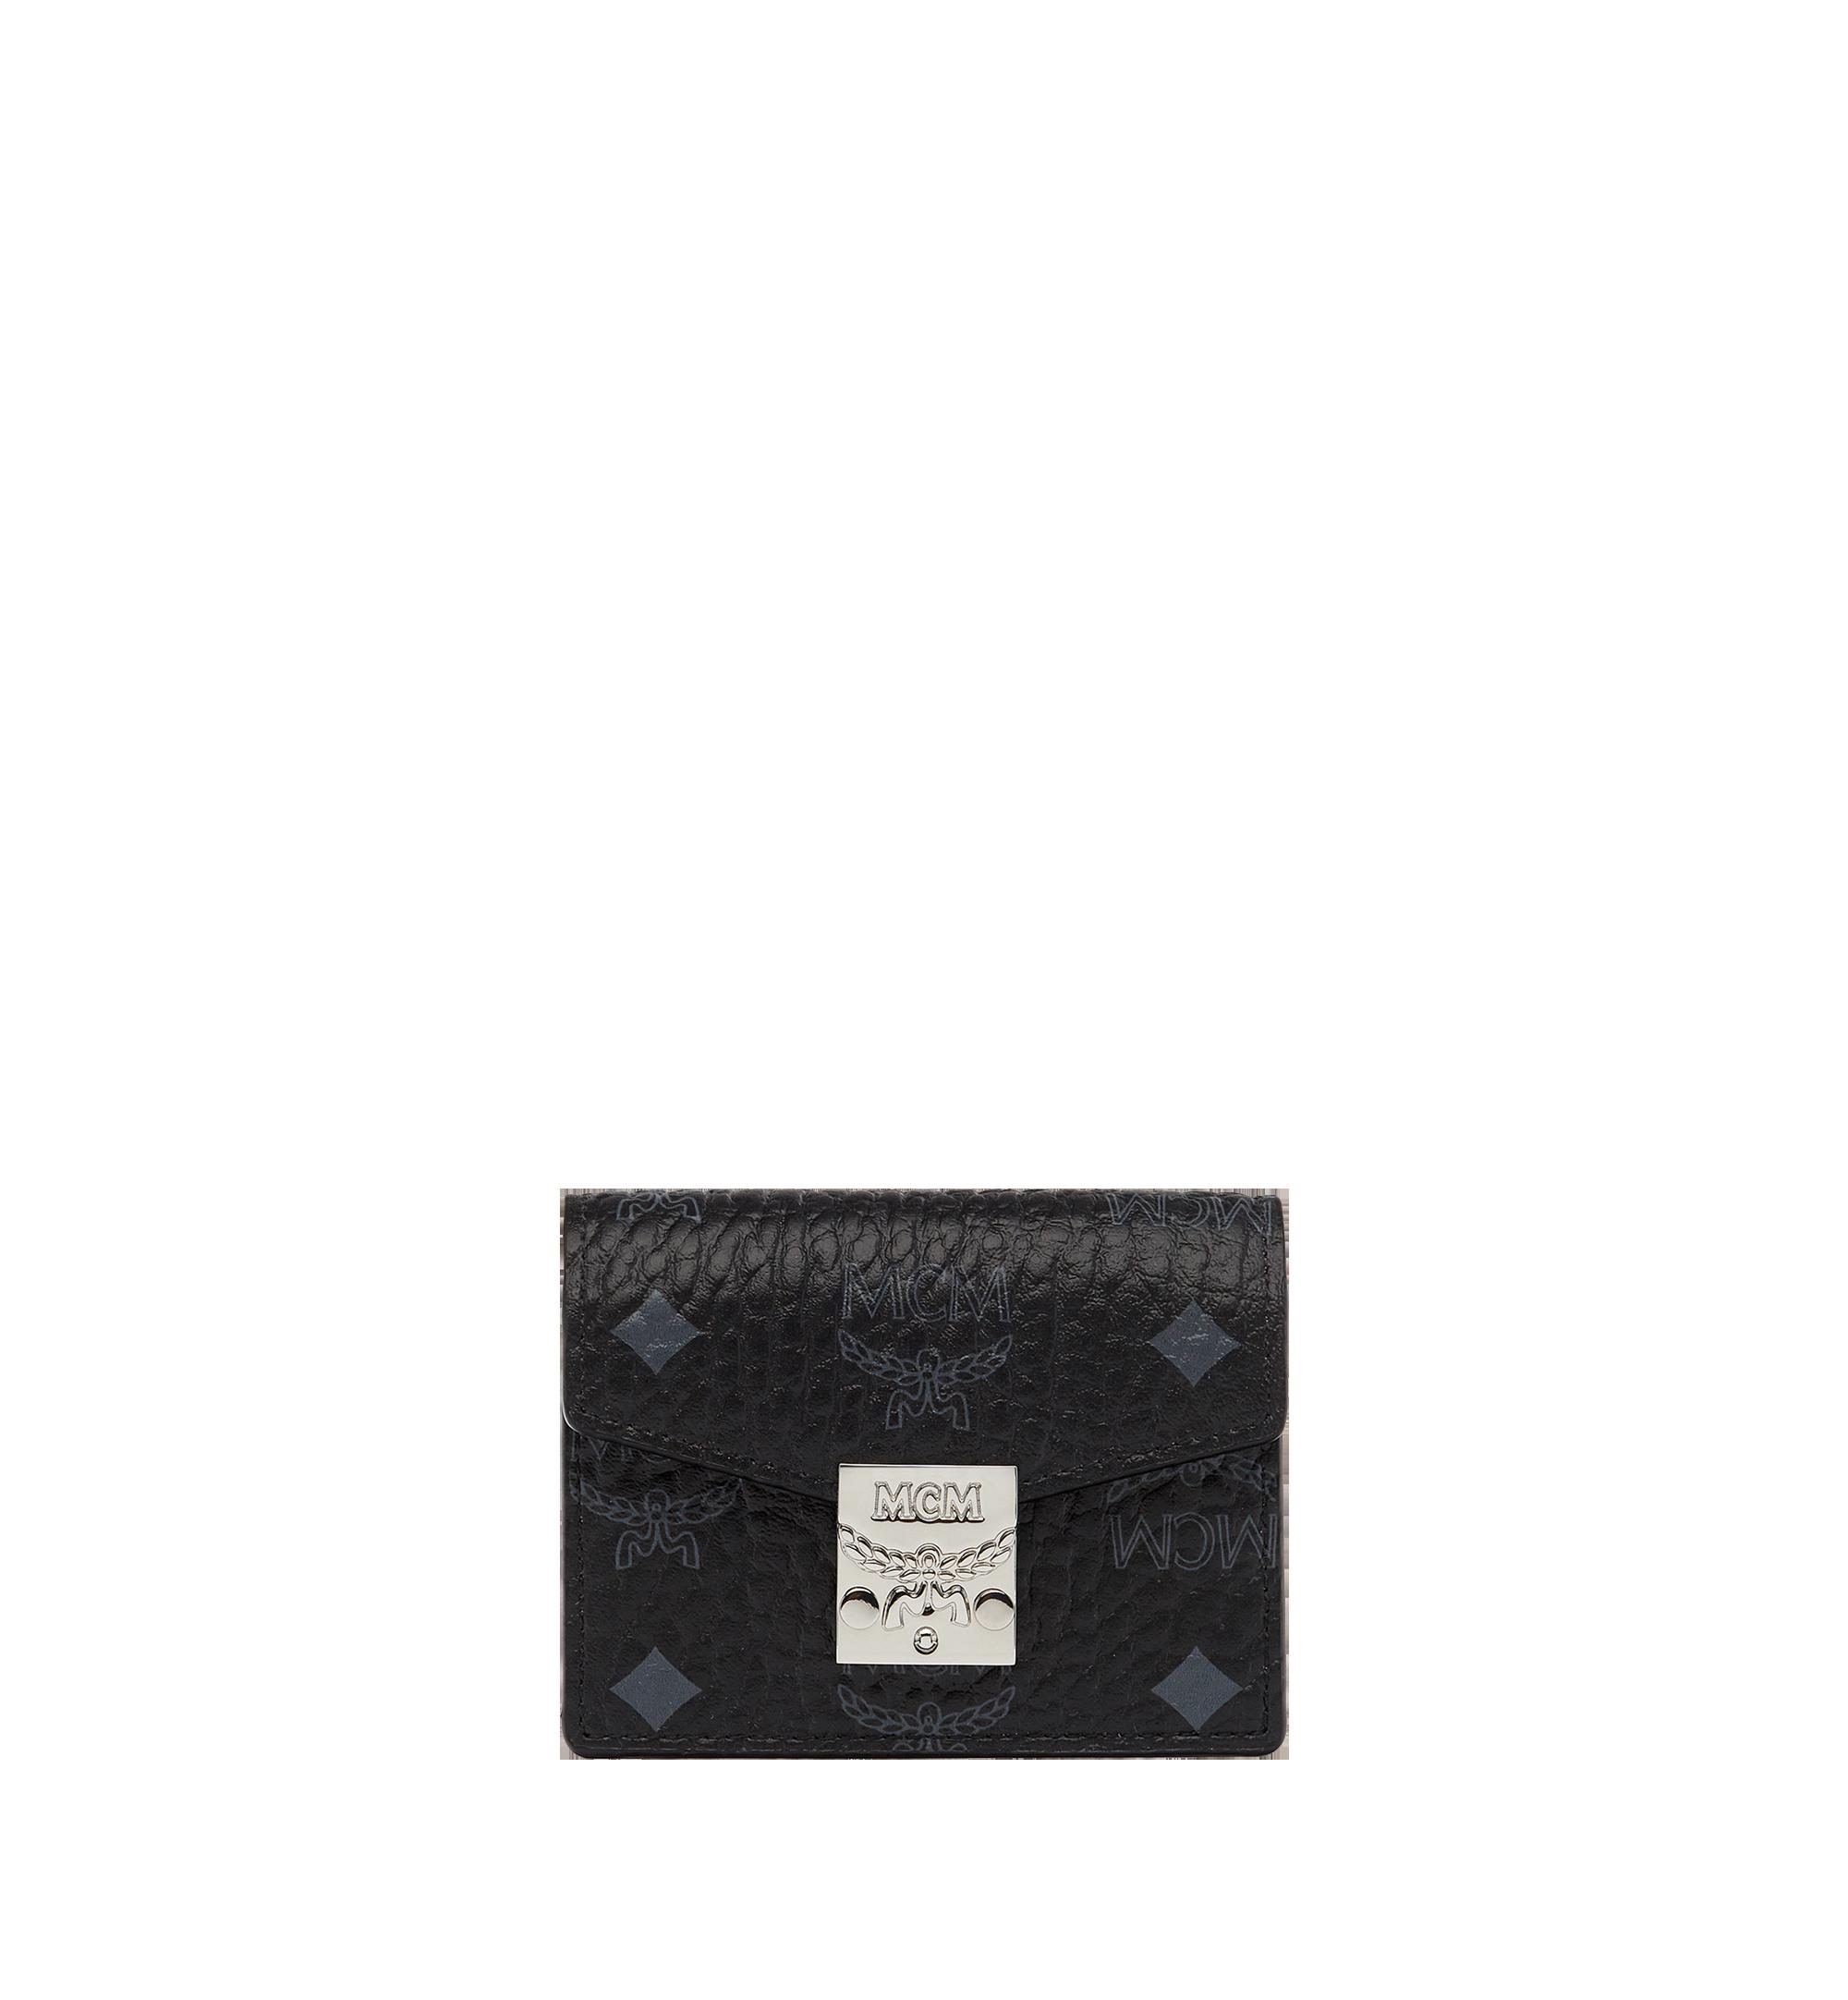 MCM Patricia Accordion Card Case in Visetos Black MYA7SPA14BK001 Alternate View 1